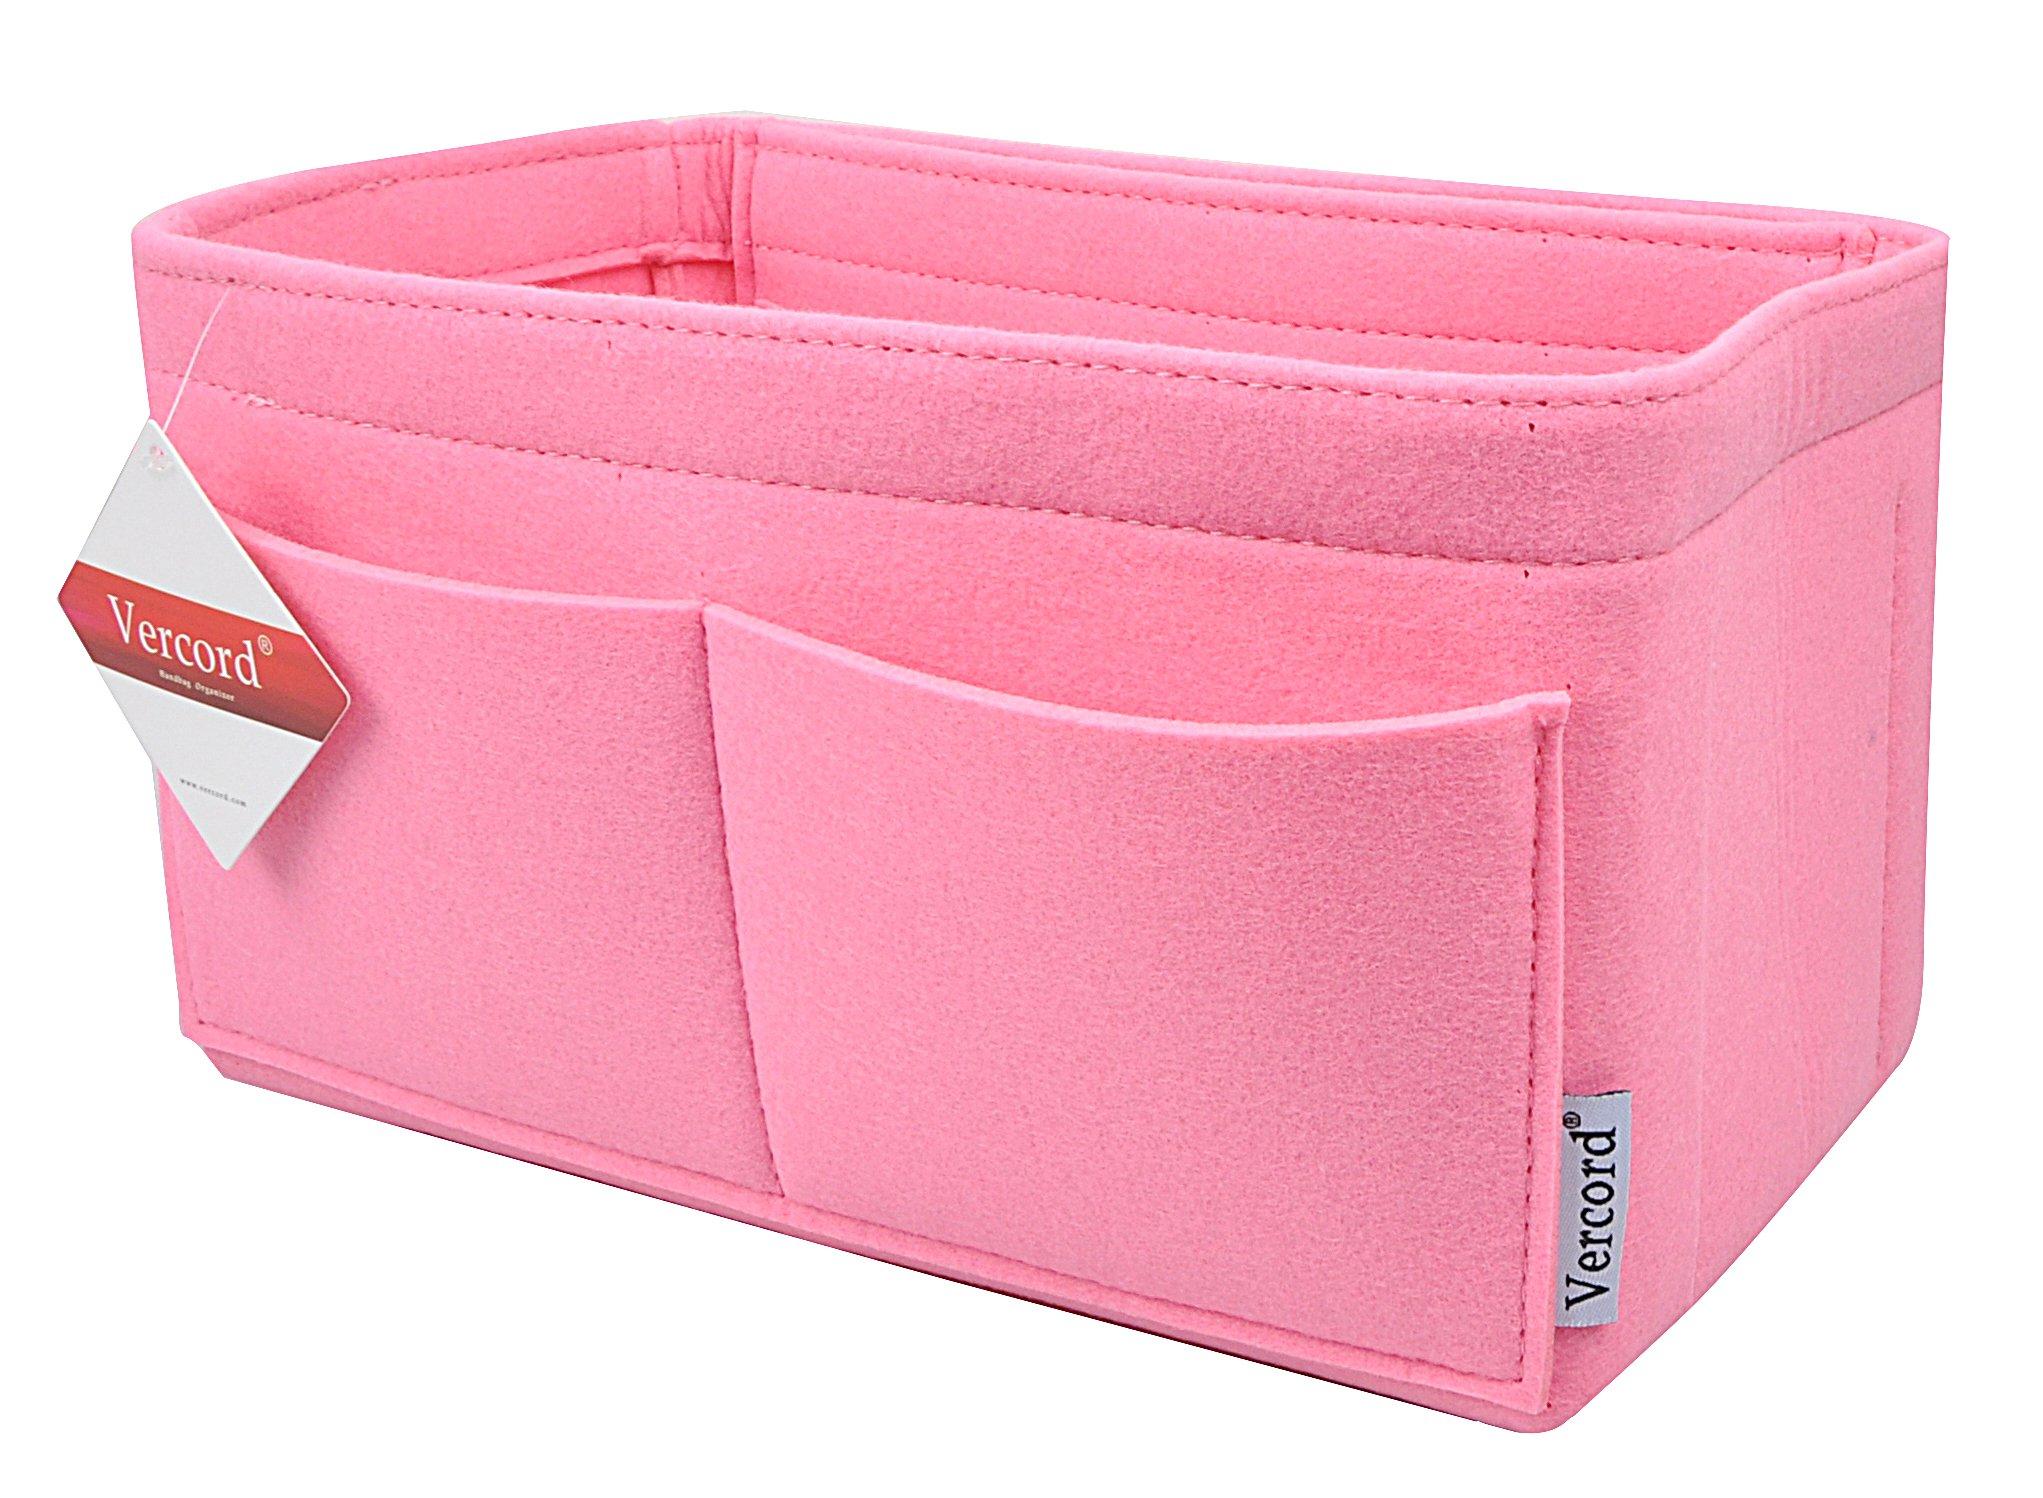 Felt Handbag organizer,Insert Purse Organizer 10 Pockets Structure Shaper 2 Size (L, Pink)